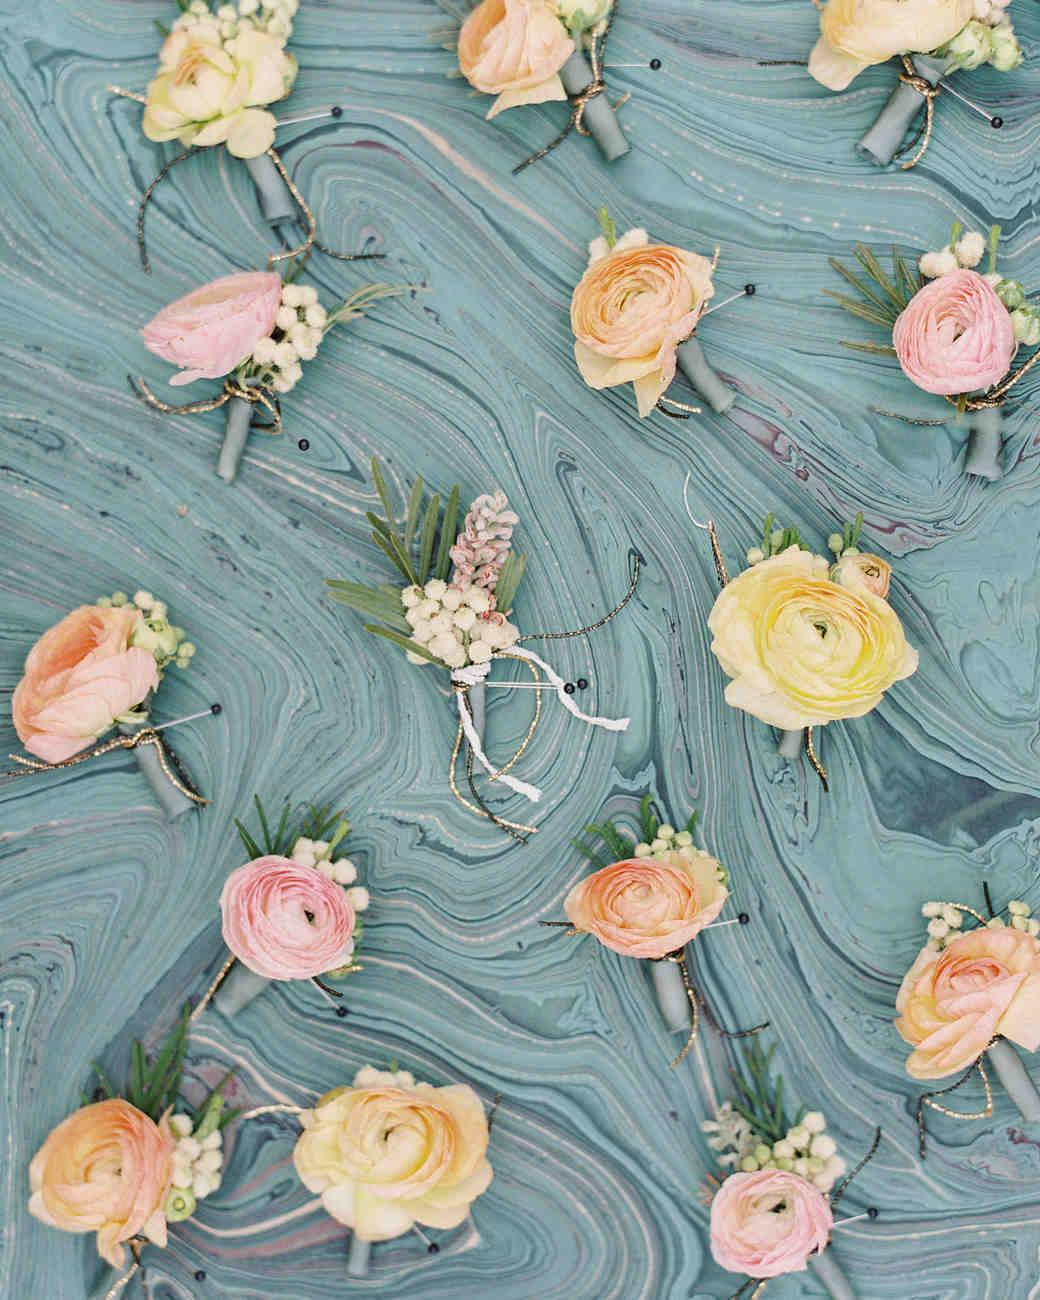 katherine-jared-wedding-0173-ds111387.jpg